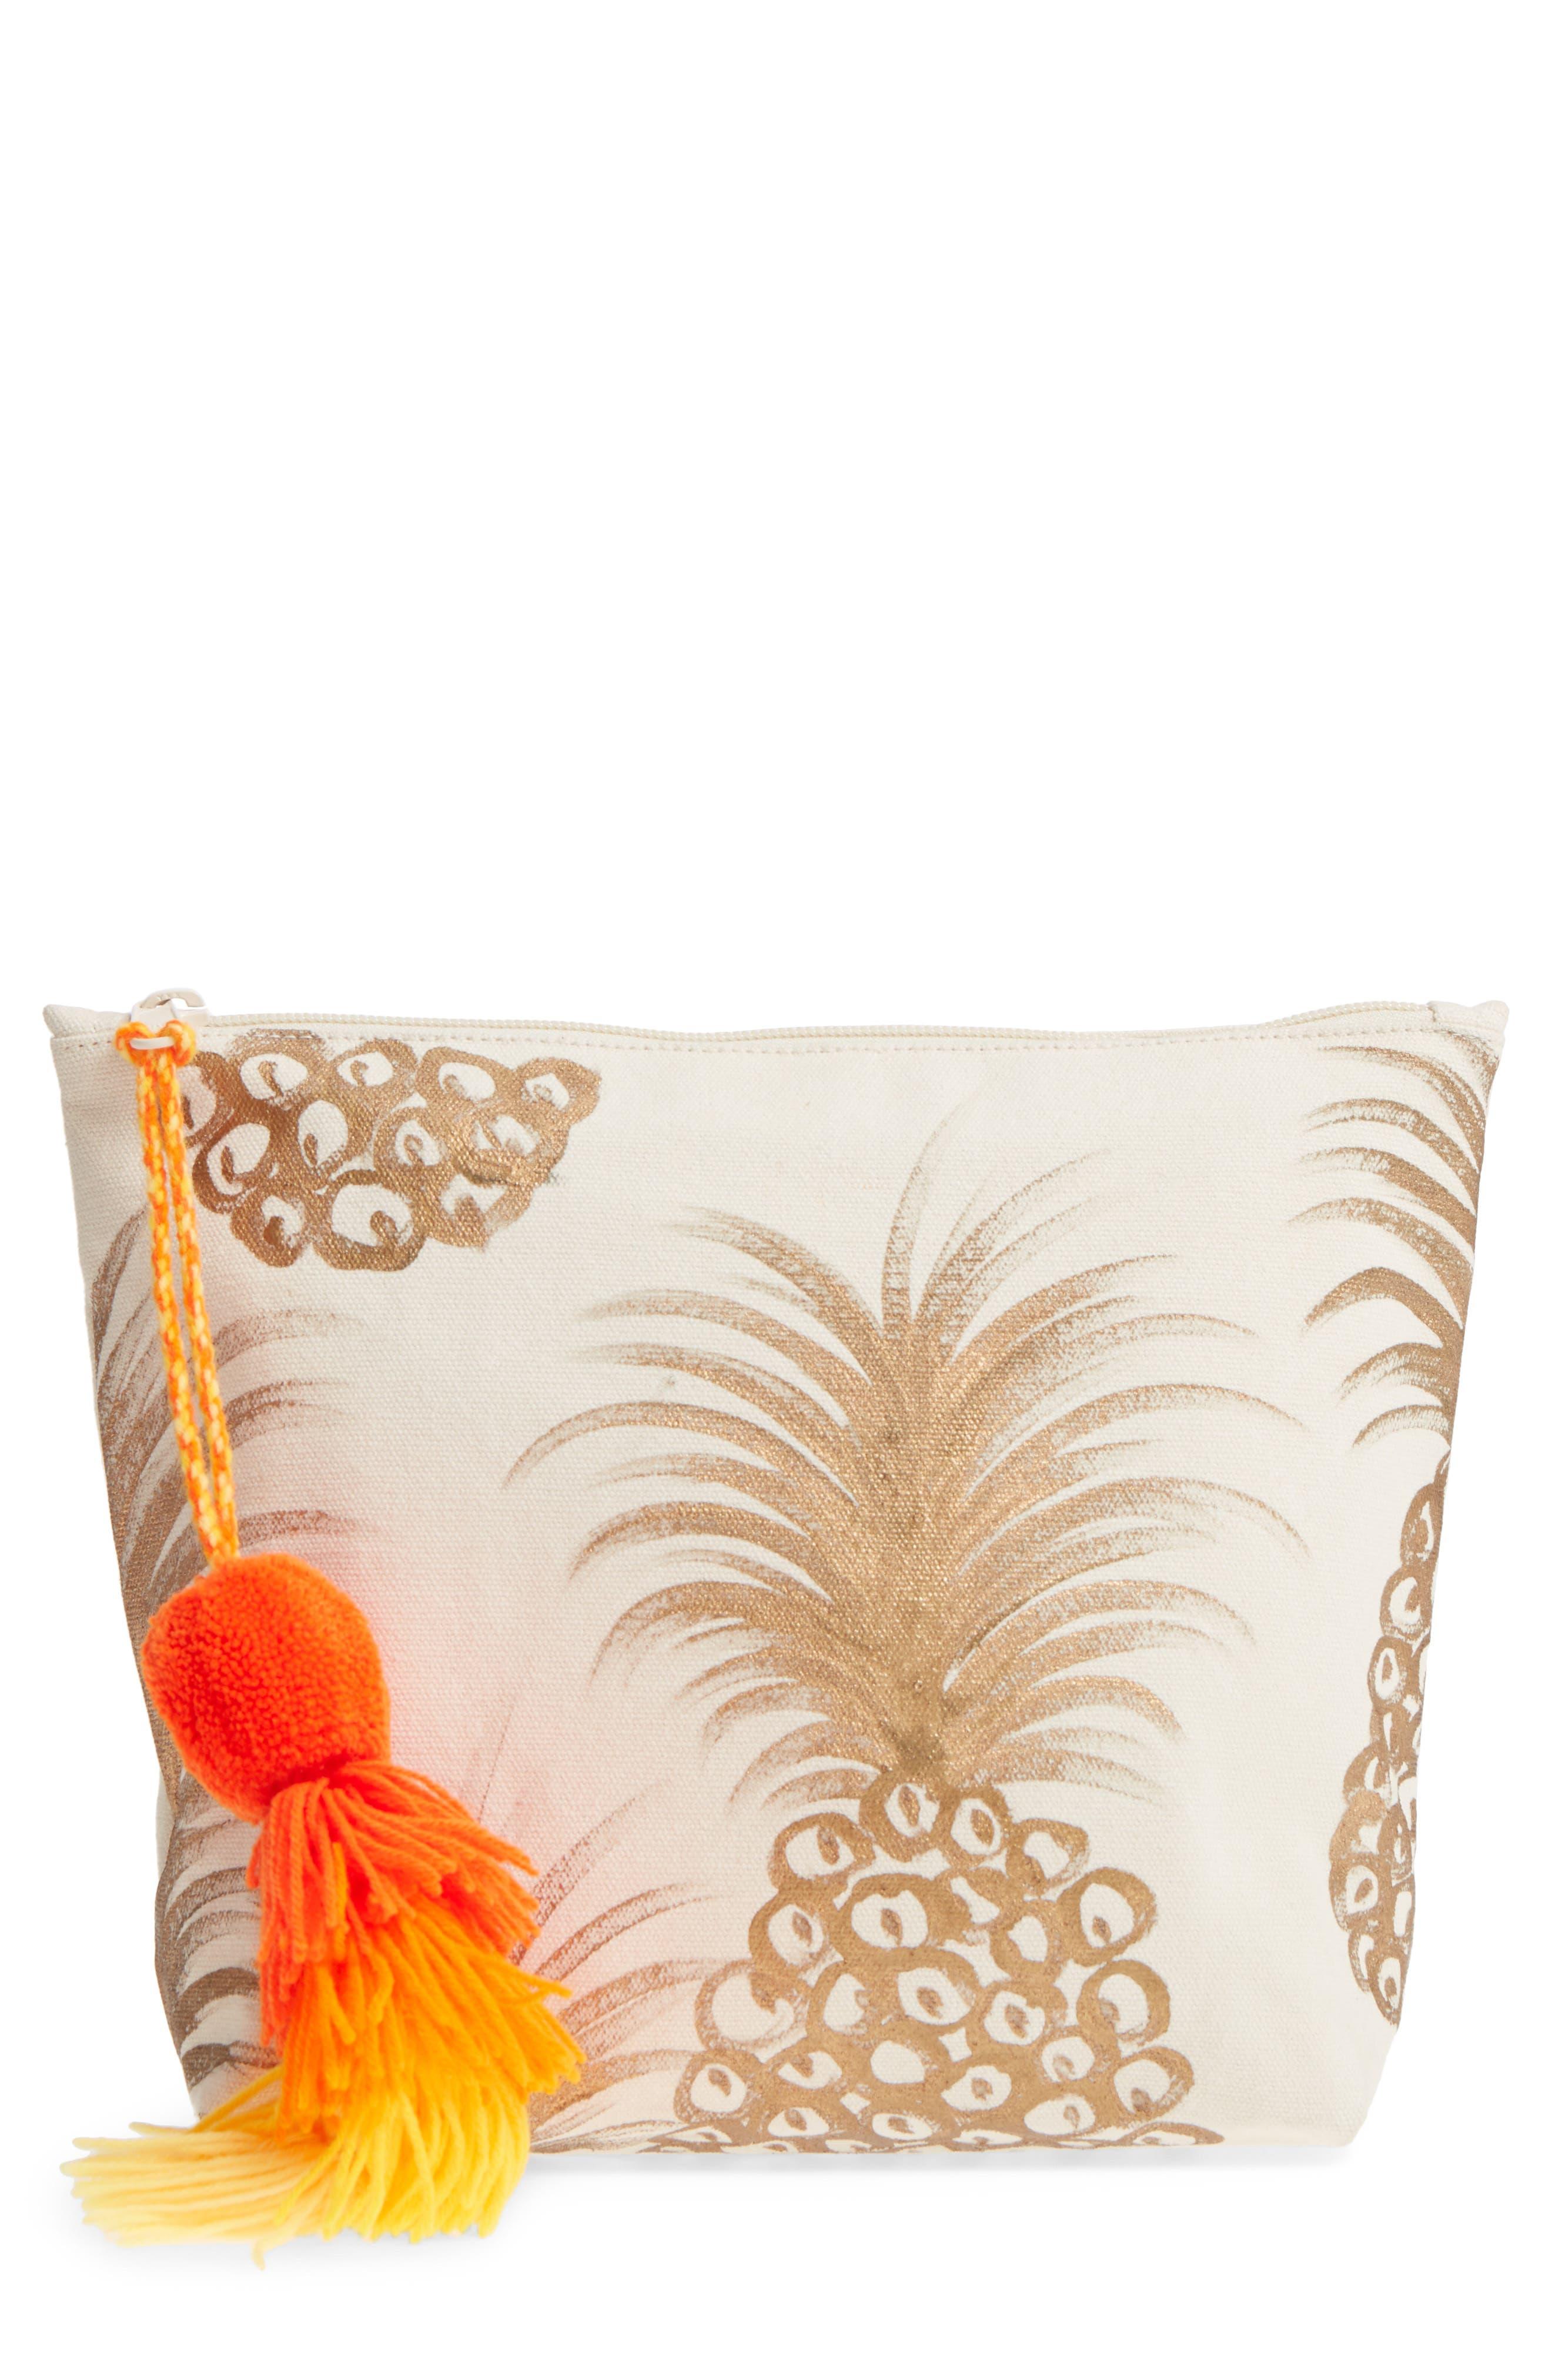 Shiraleah Tropicana Tassel Cosmetic Pouch